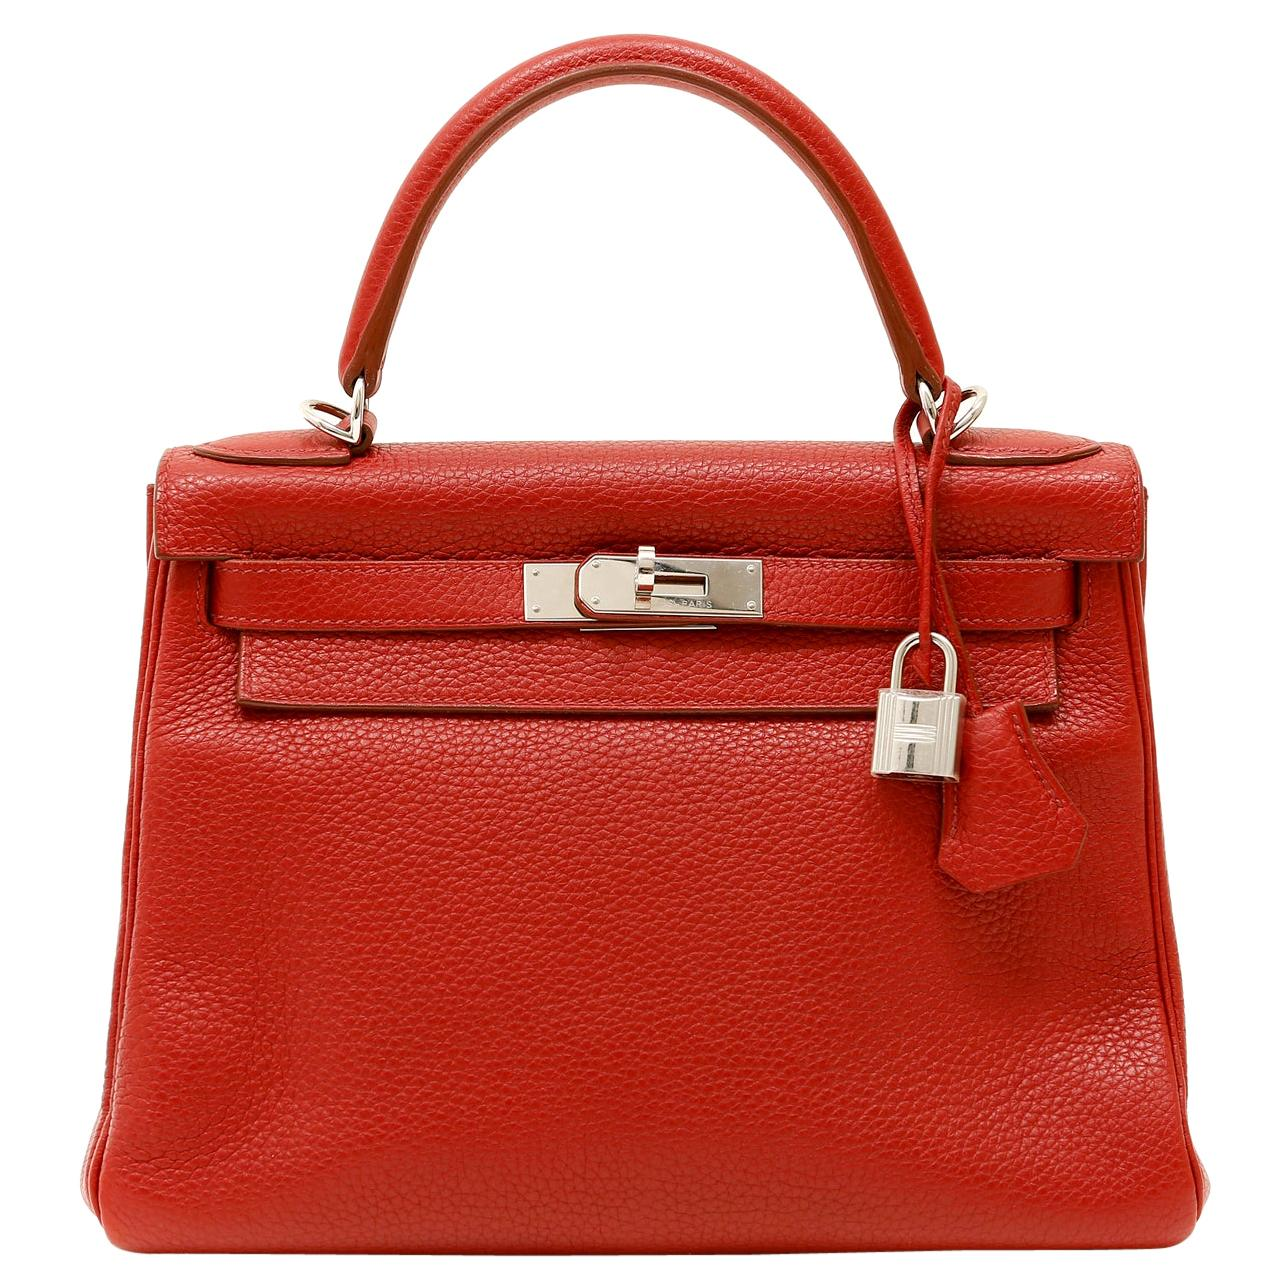 Hermès Garnet Red Togo Leather 28 cm Kelly Bag with Palladium